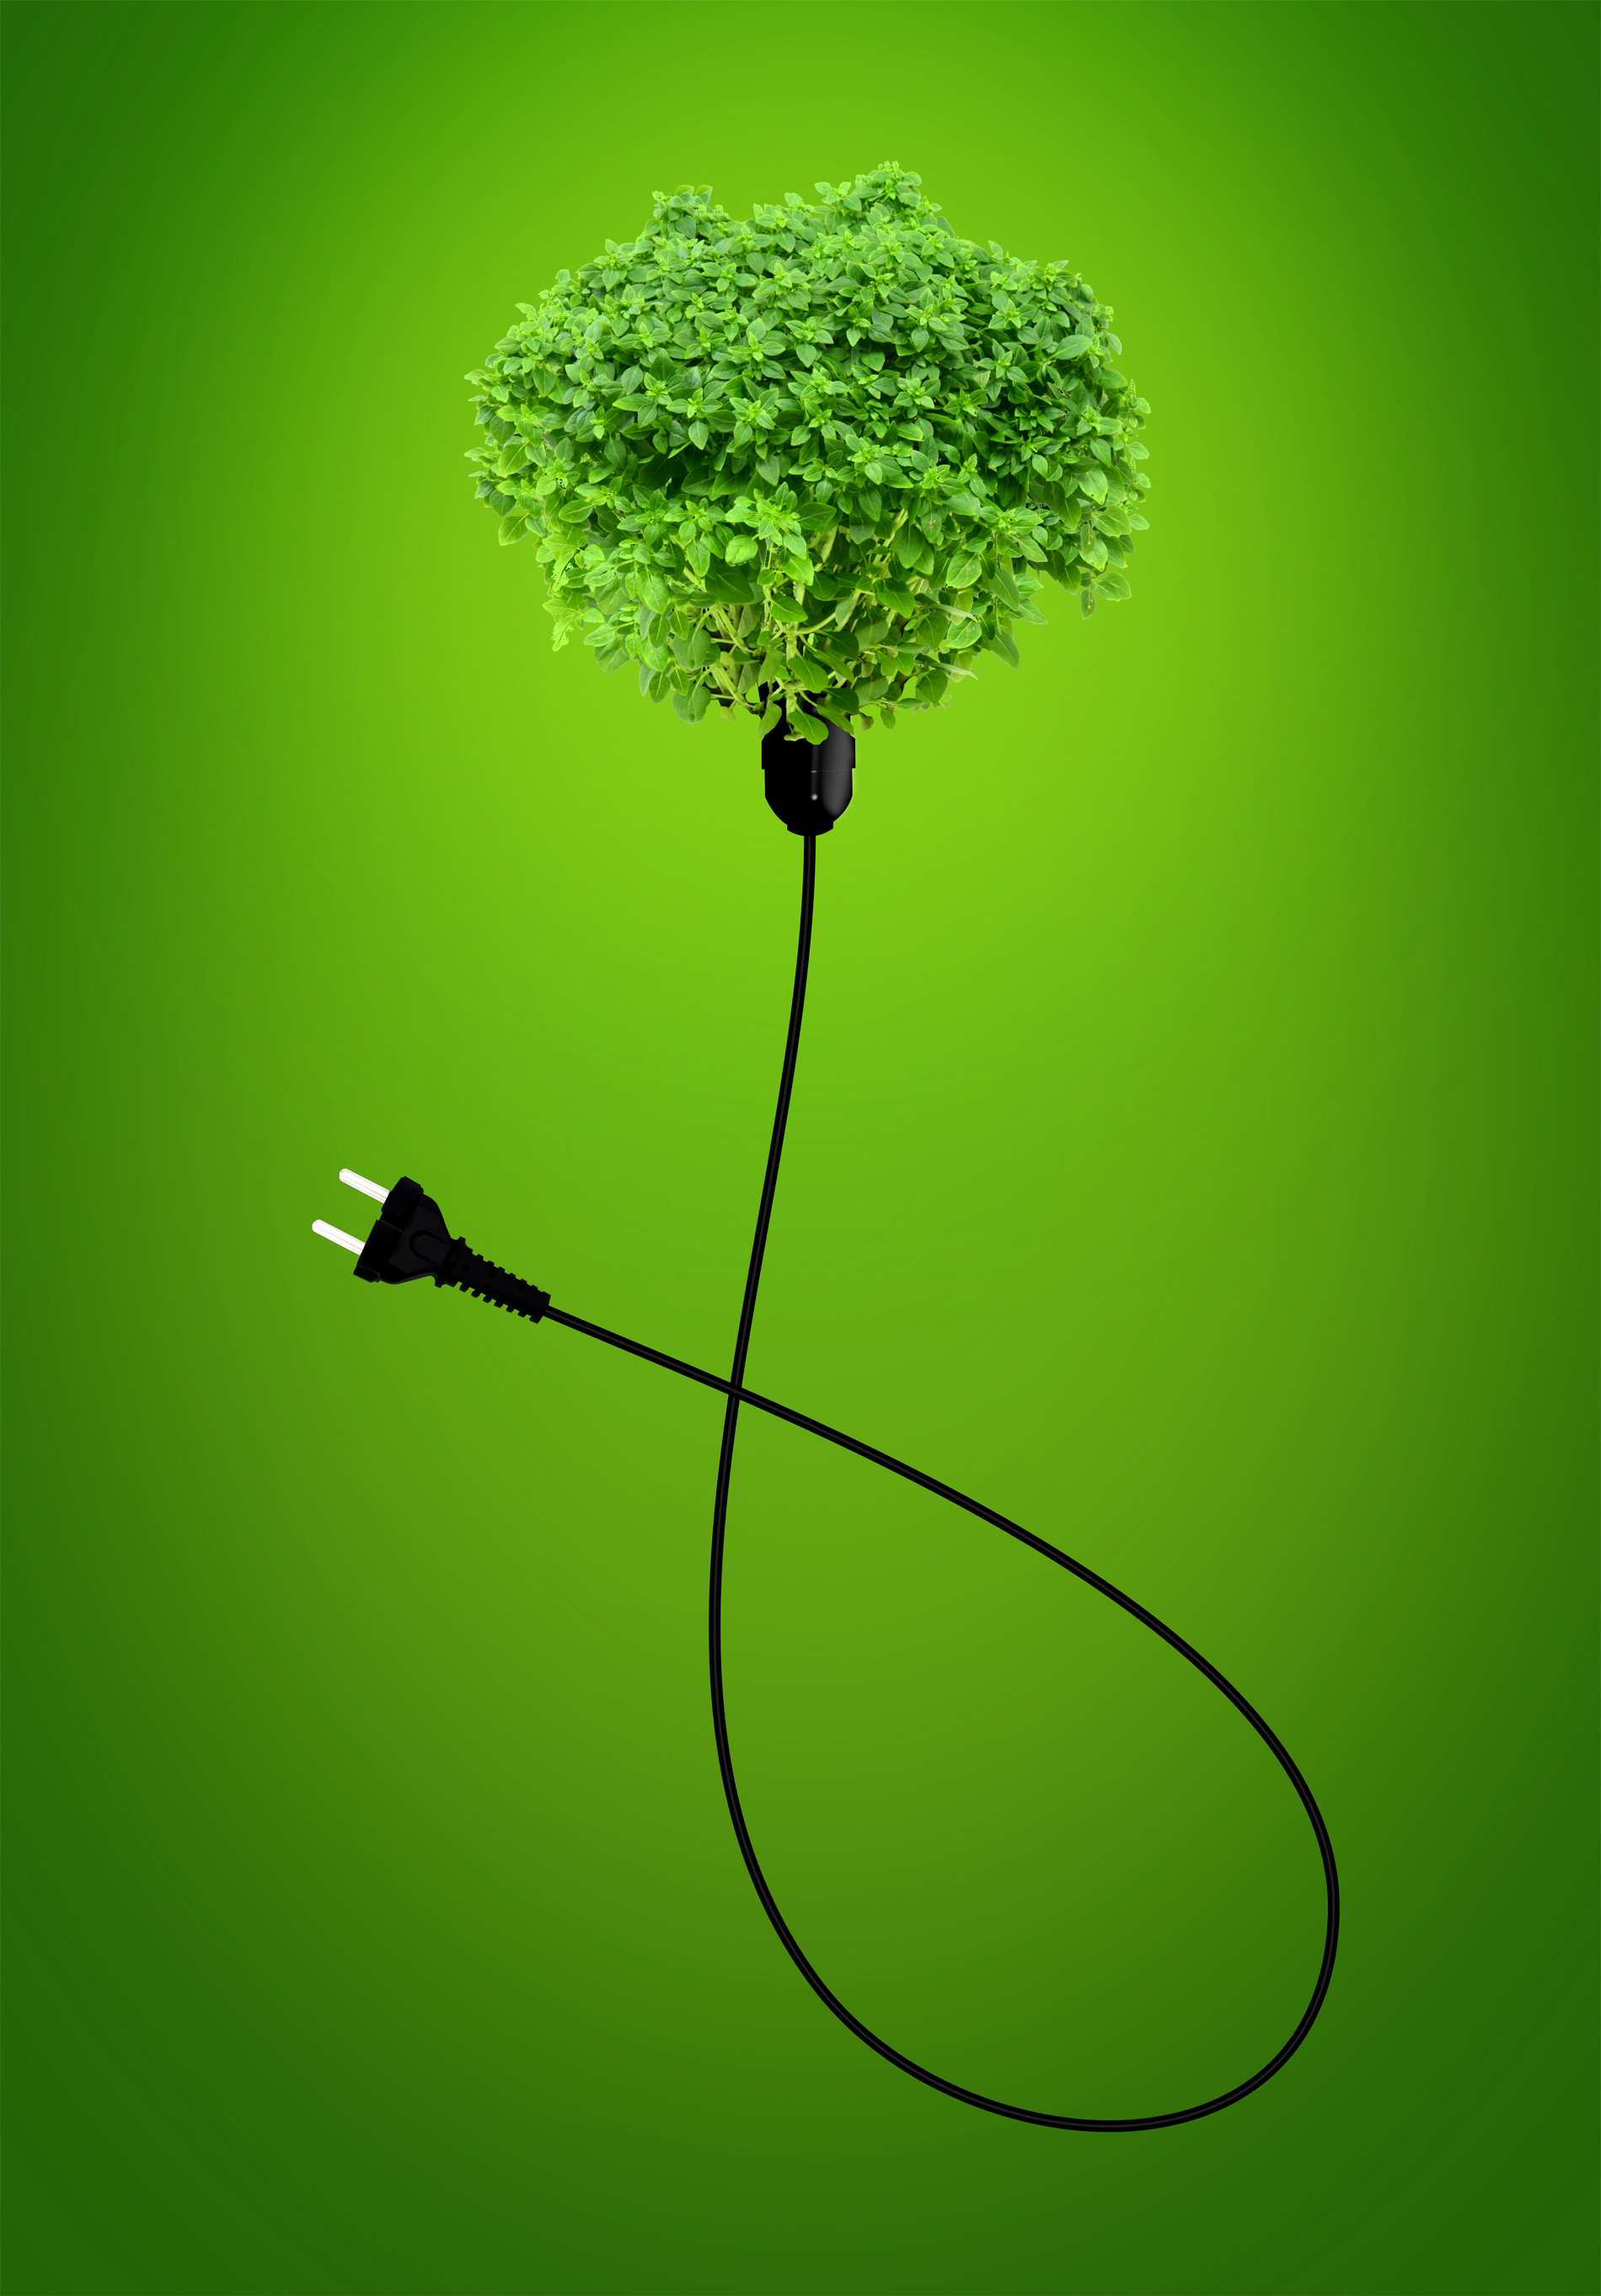 Clean energy concept - a green power plug photo